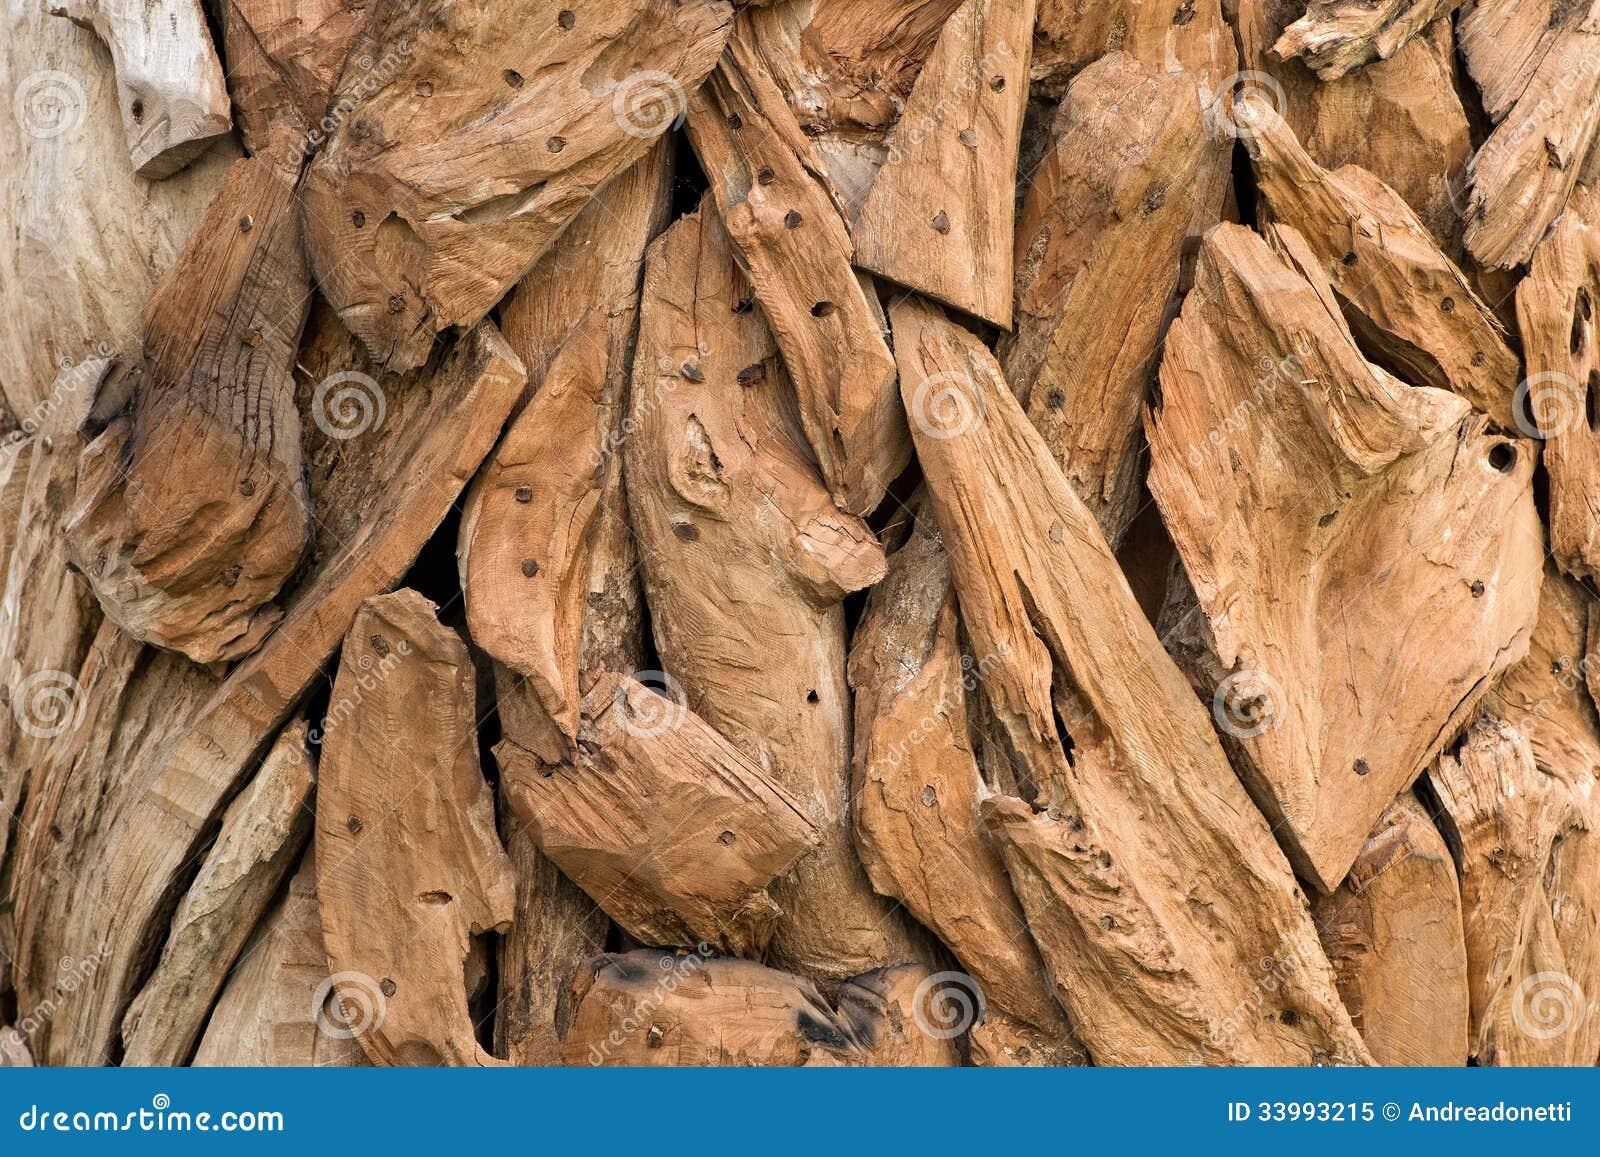 Ornamental dried wood pieces